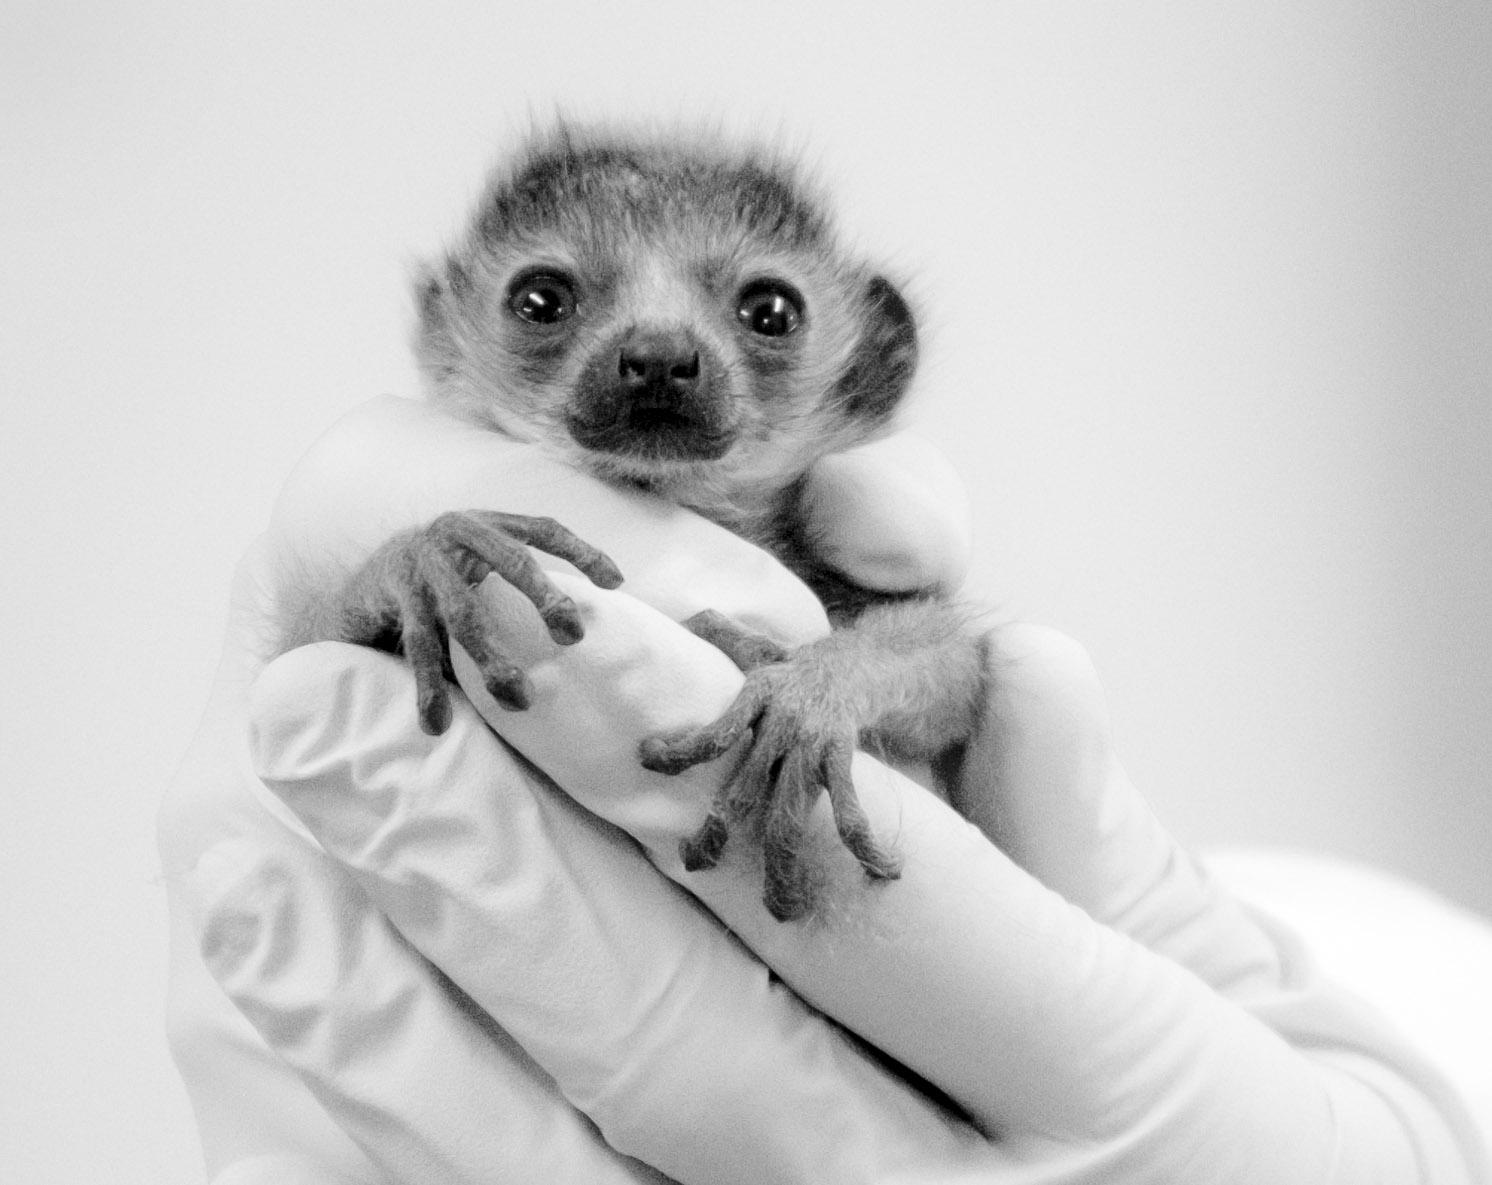 mongoose lemur infant nacho